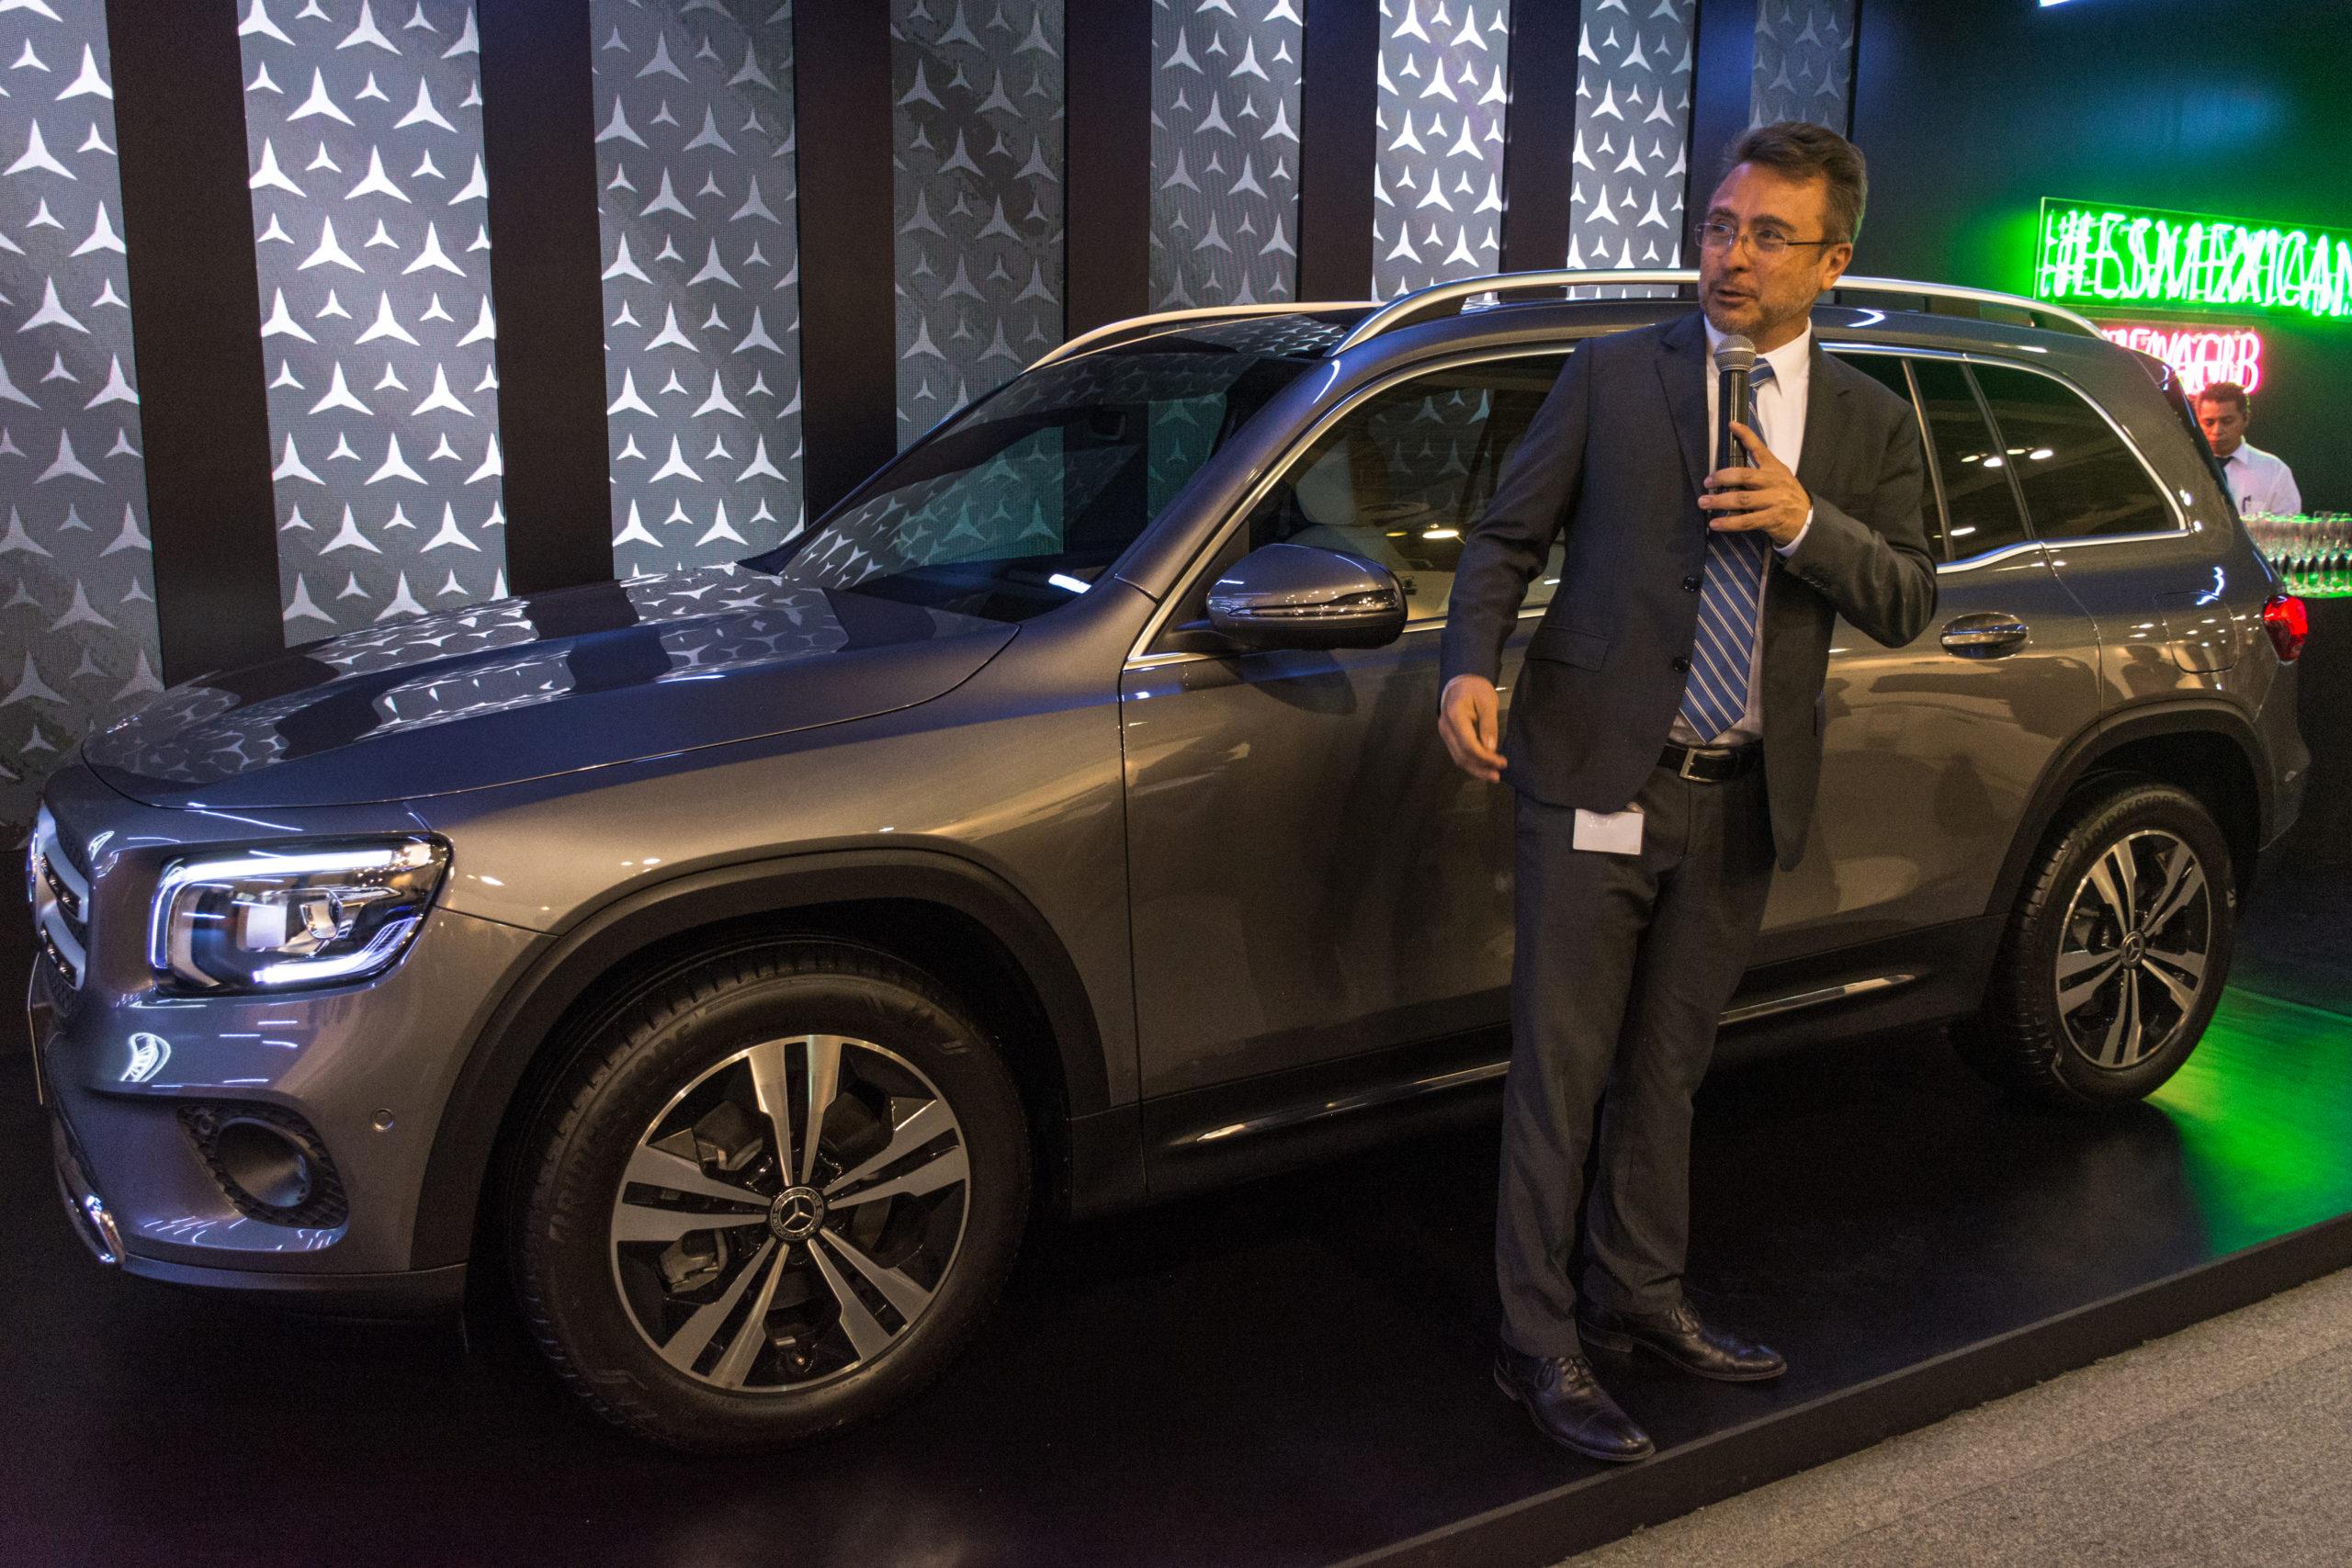 Presentacion-Nueva-Mercedes-Benz-GLB-250-Zona-Maco